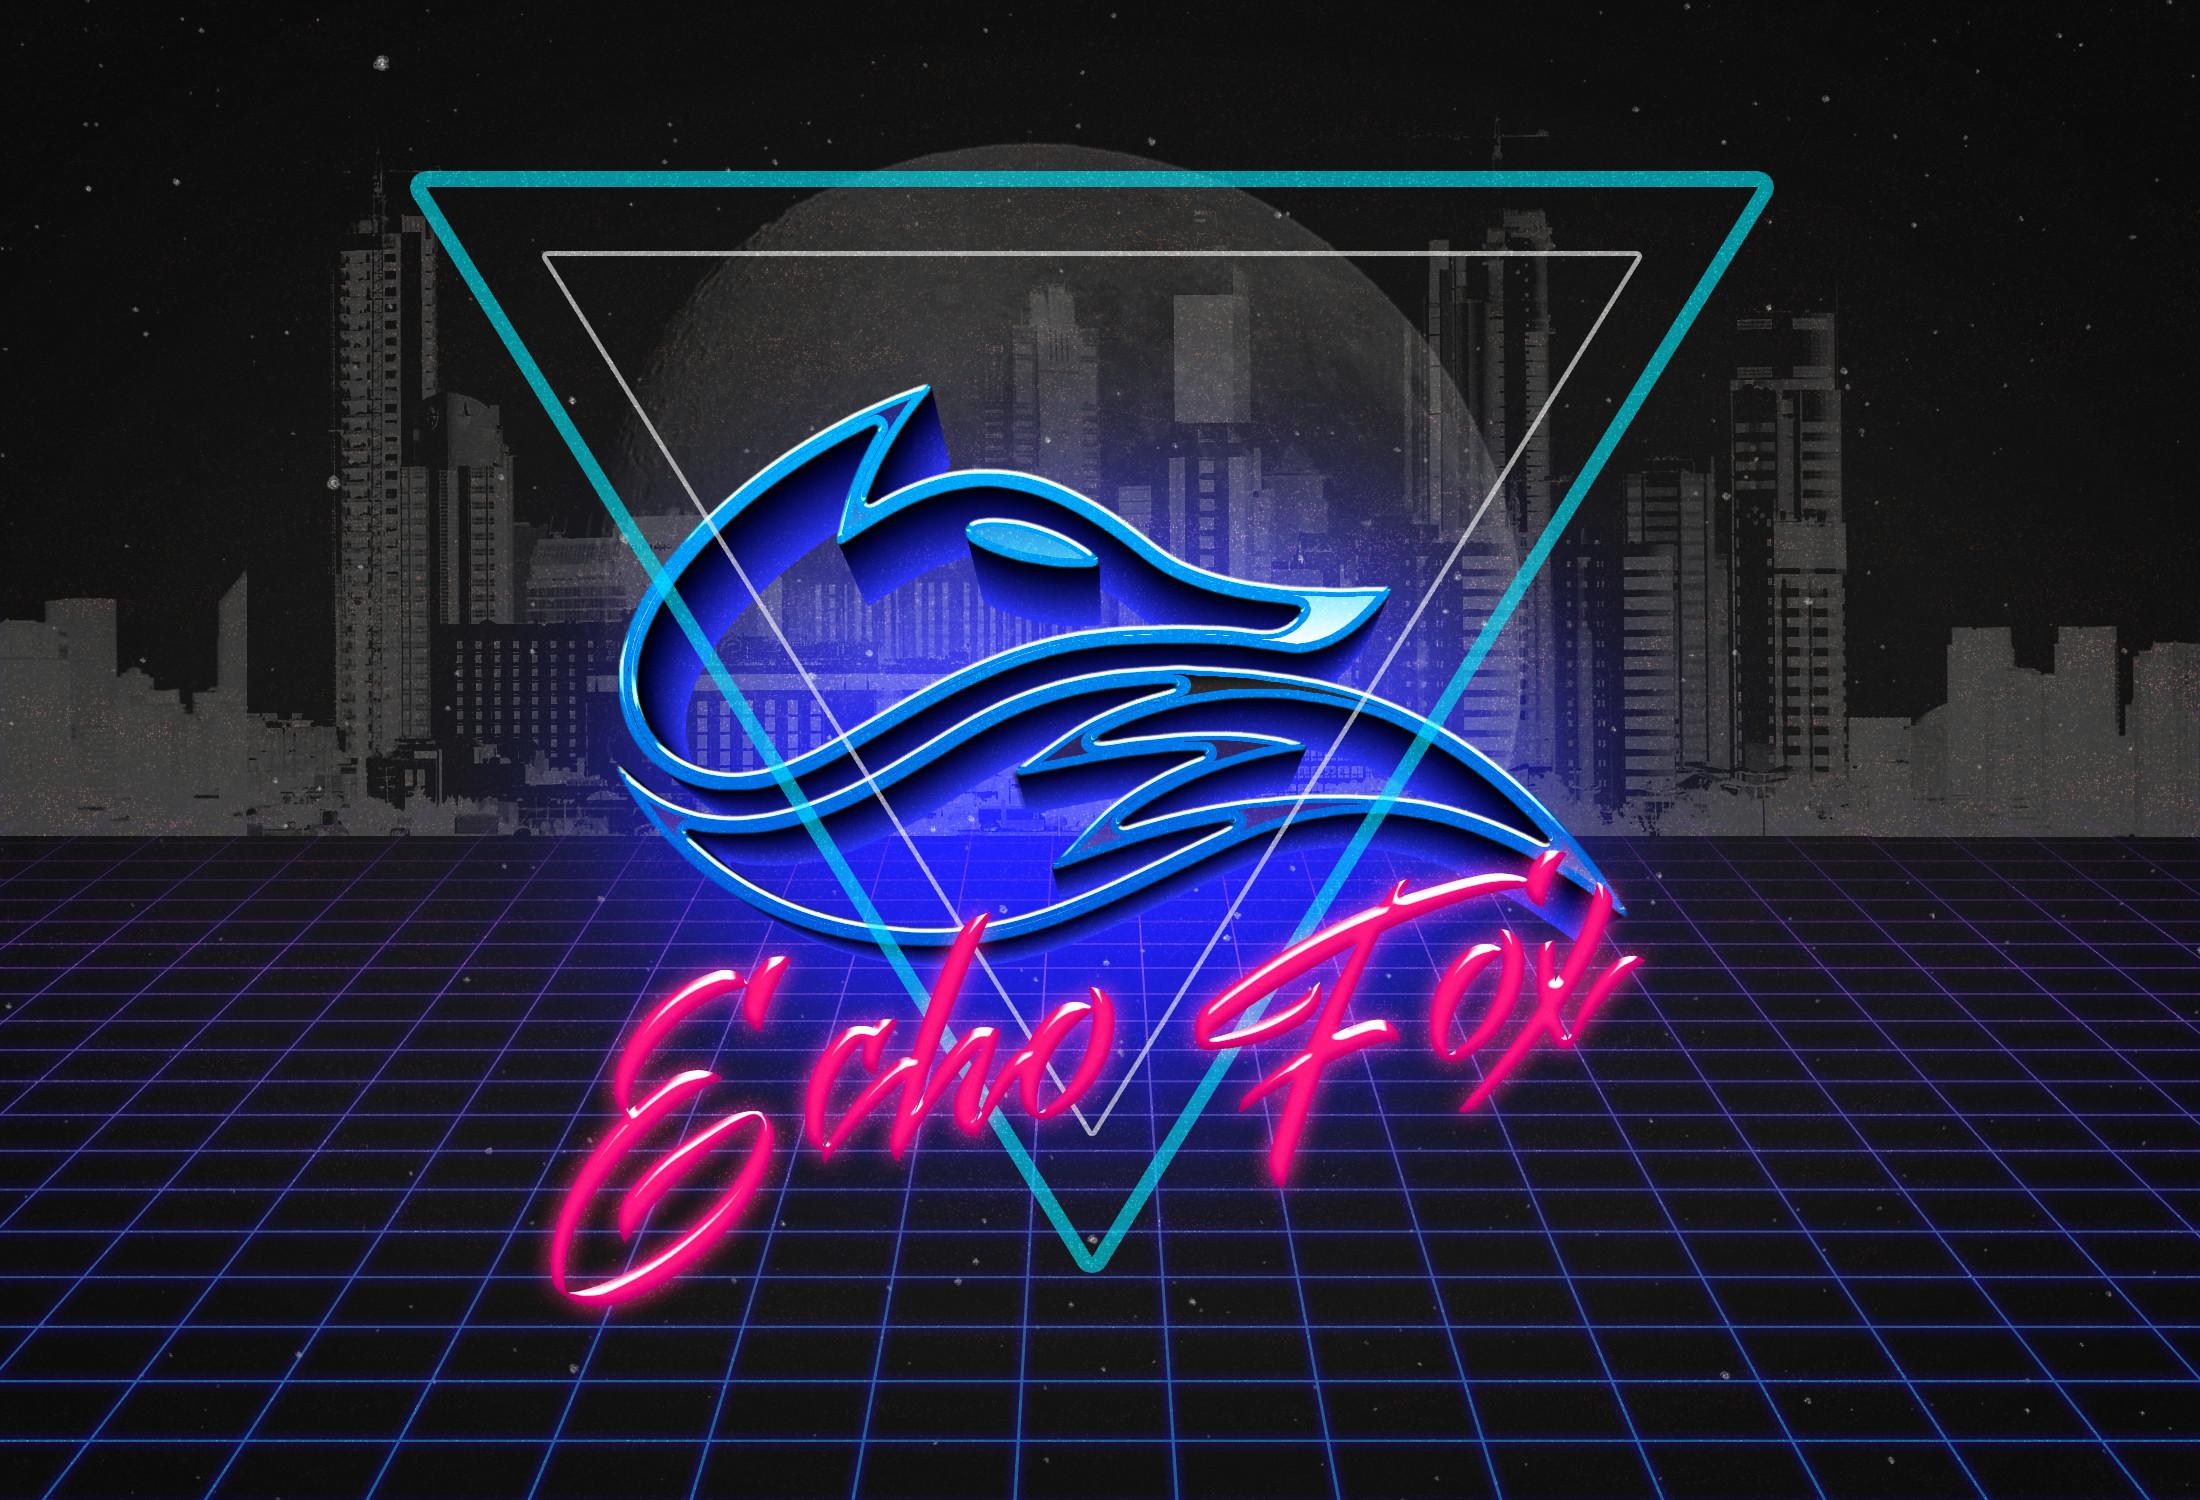 Fluffechofox 80s wallpaper, credit to u/CaptainRako …